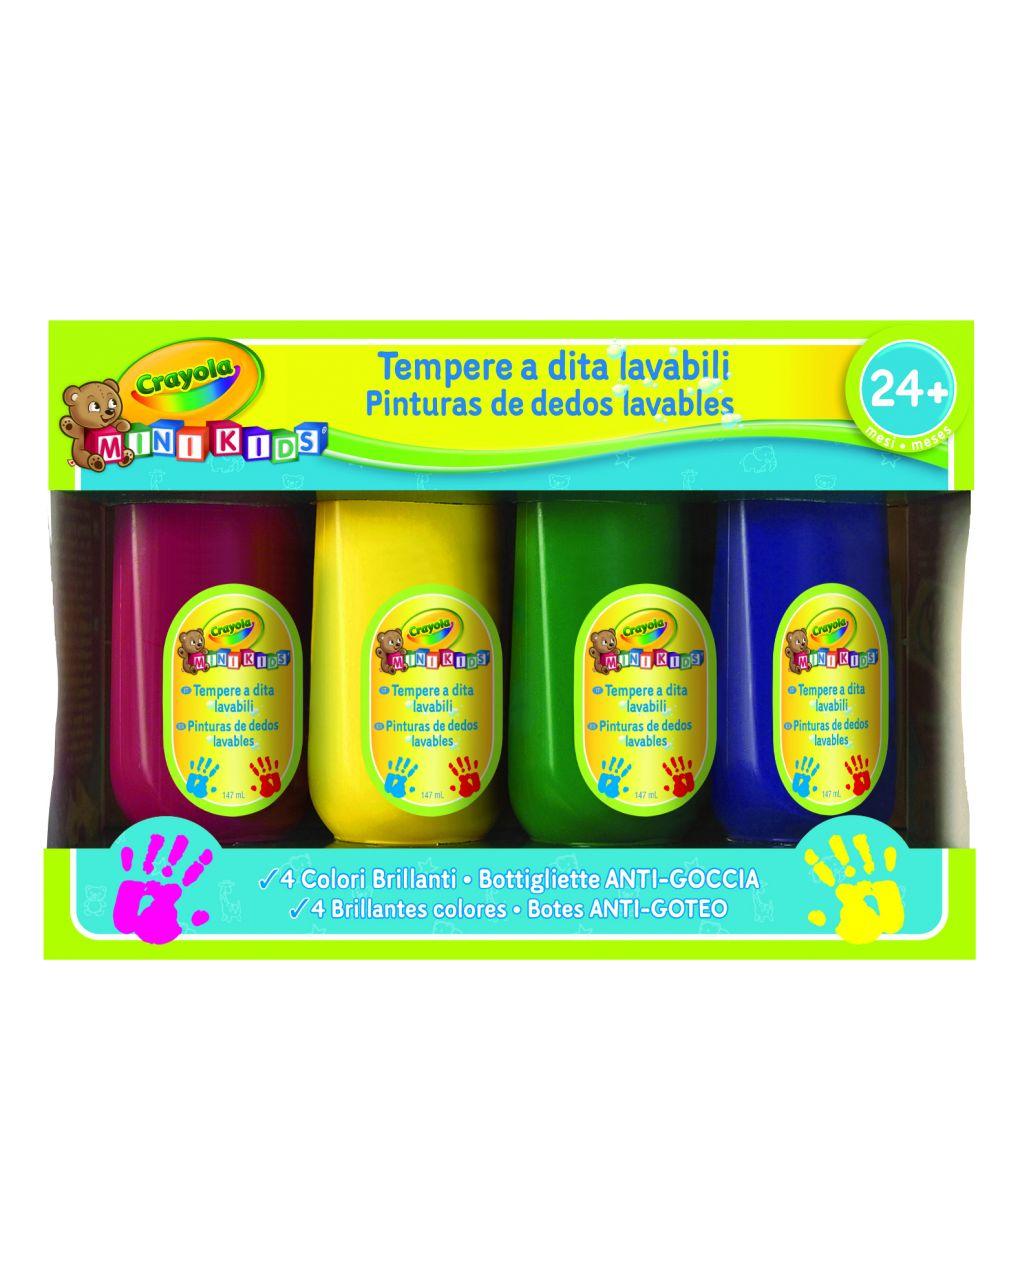 Crayola - 4 tempere a dita lavabili mini kids - Crayola